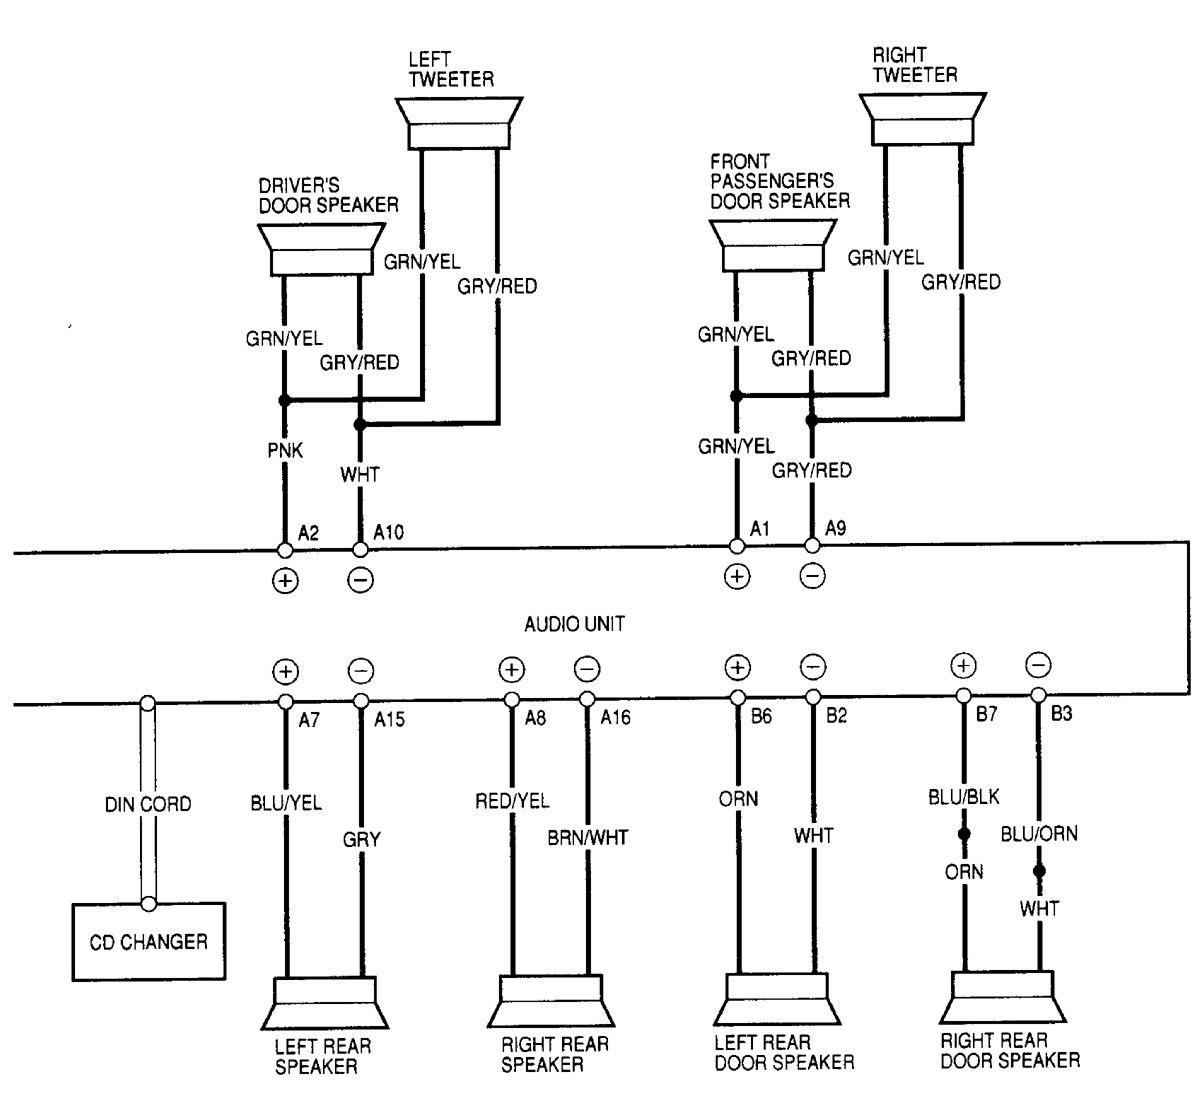 acura rl  2000 - 2001  - wiring diagrams